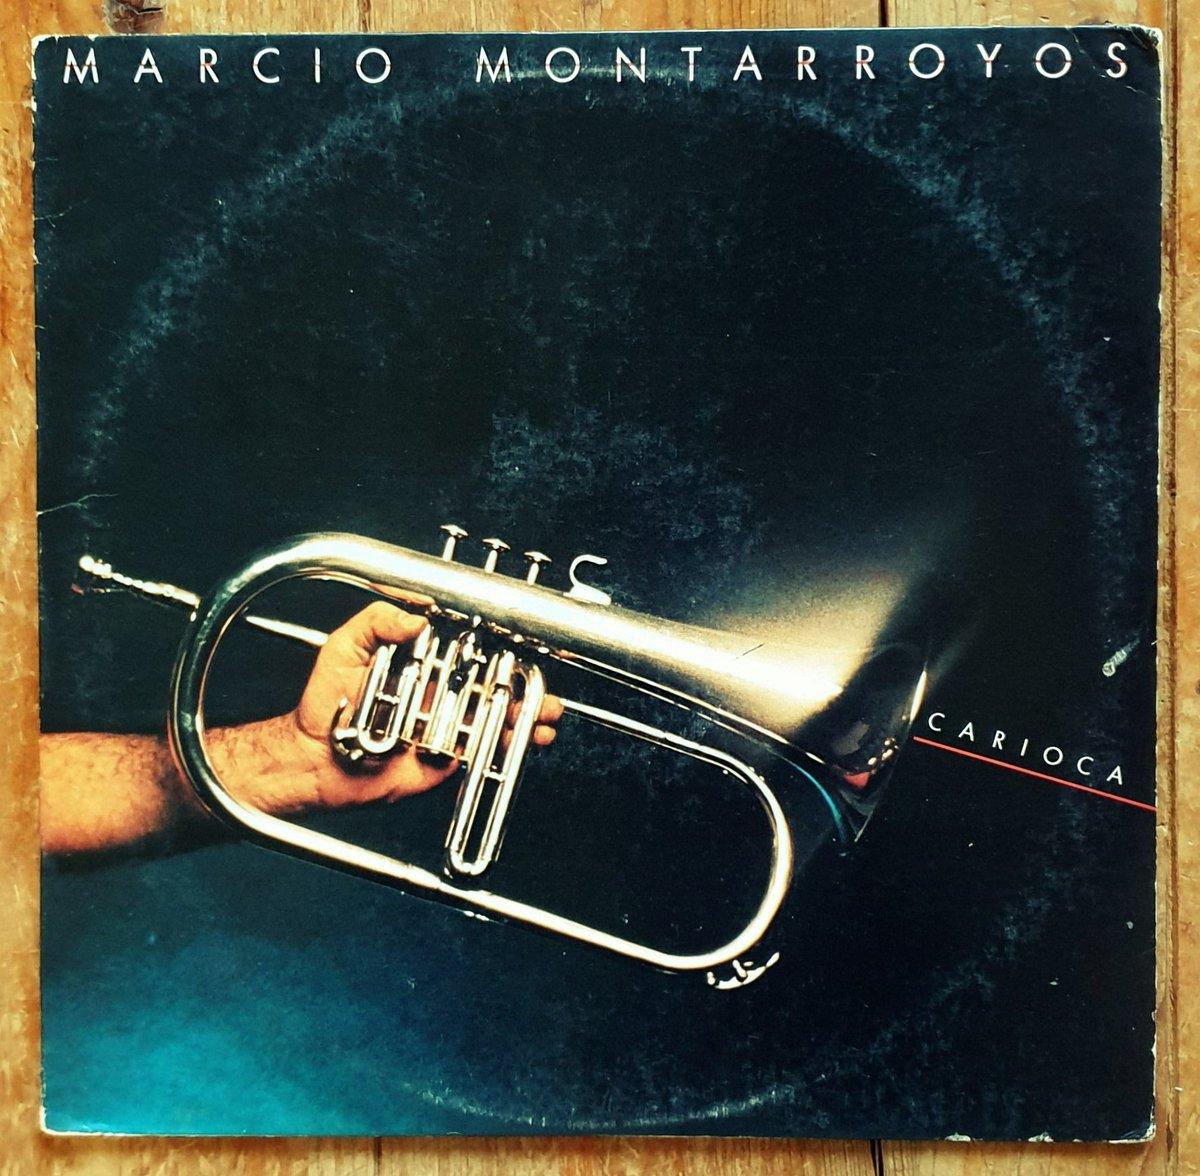 #MarcioMontarroyos – #Carioca Label: #ColumbiaRecords – FC 38952 Format: Vinyl, #LP, #Album Country: US Released: 1983 Genre: #LatinJazz Style: Soul-Jazz, #Fusion  #instavinyl #instarecords #vinylrecordcollection #rhythms #latinjazzoftheday #trumpet https://www.instagram.com/p/B79THJ0pQI4/?igshid=bonn5gzgsuas…pic.twitter.com/5xNa2NKshx